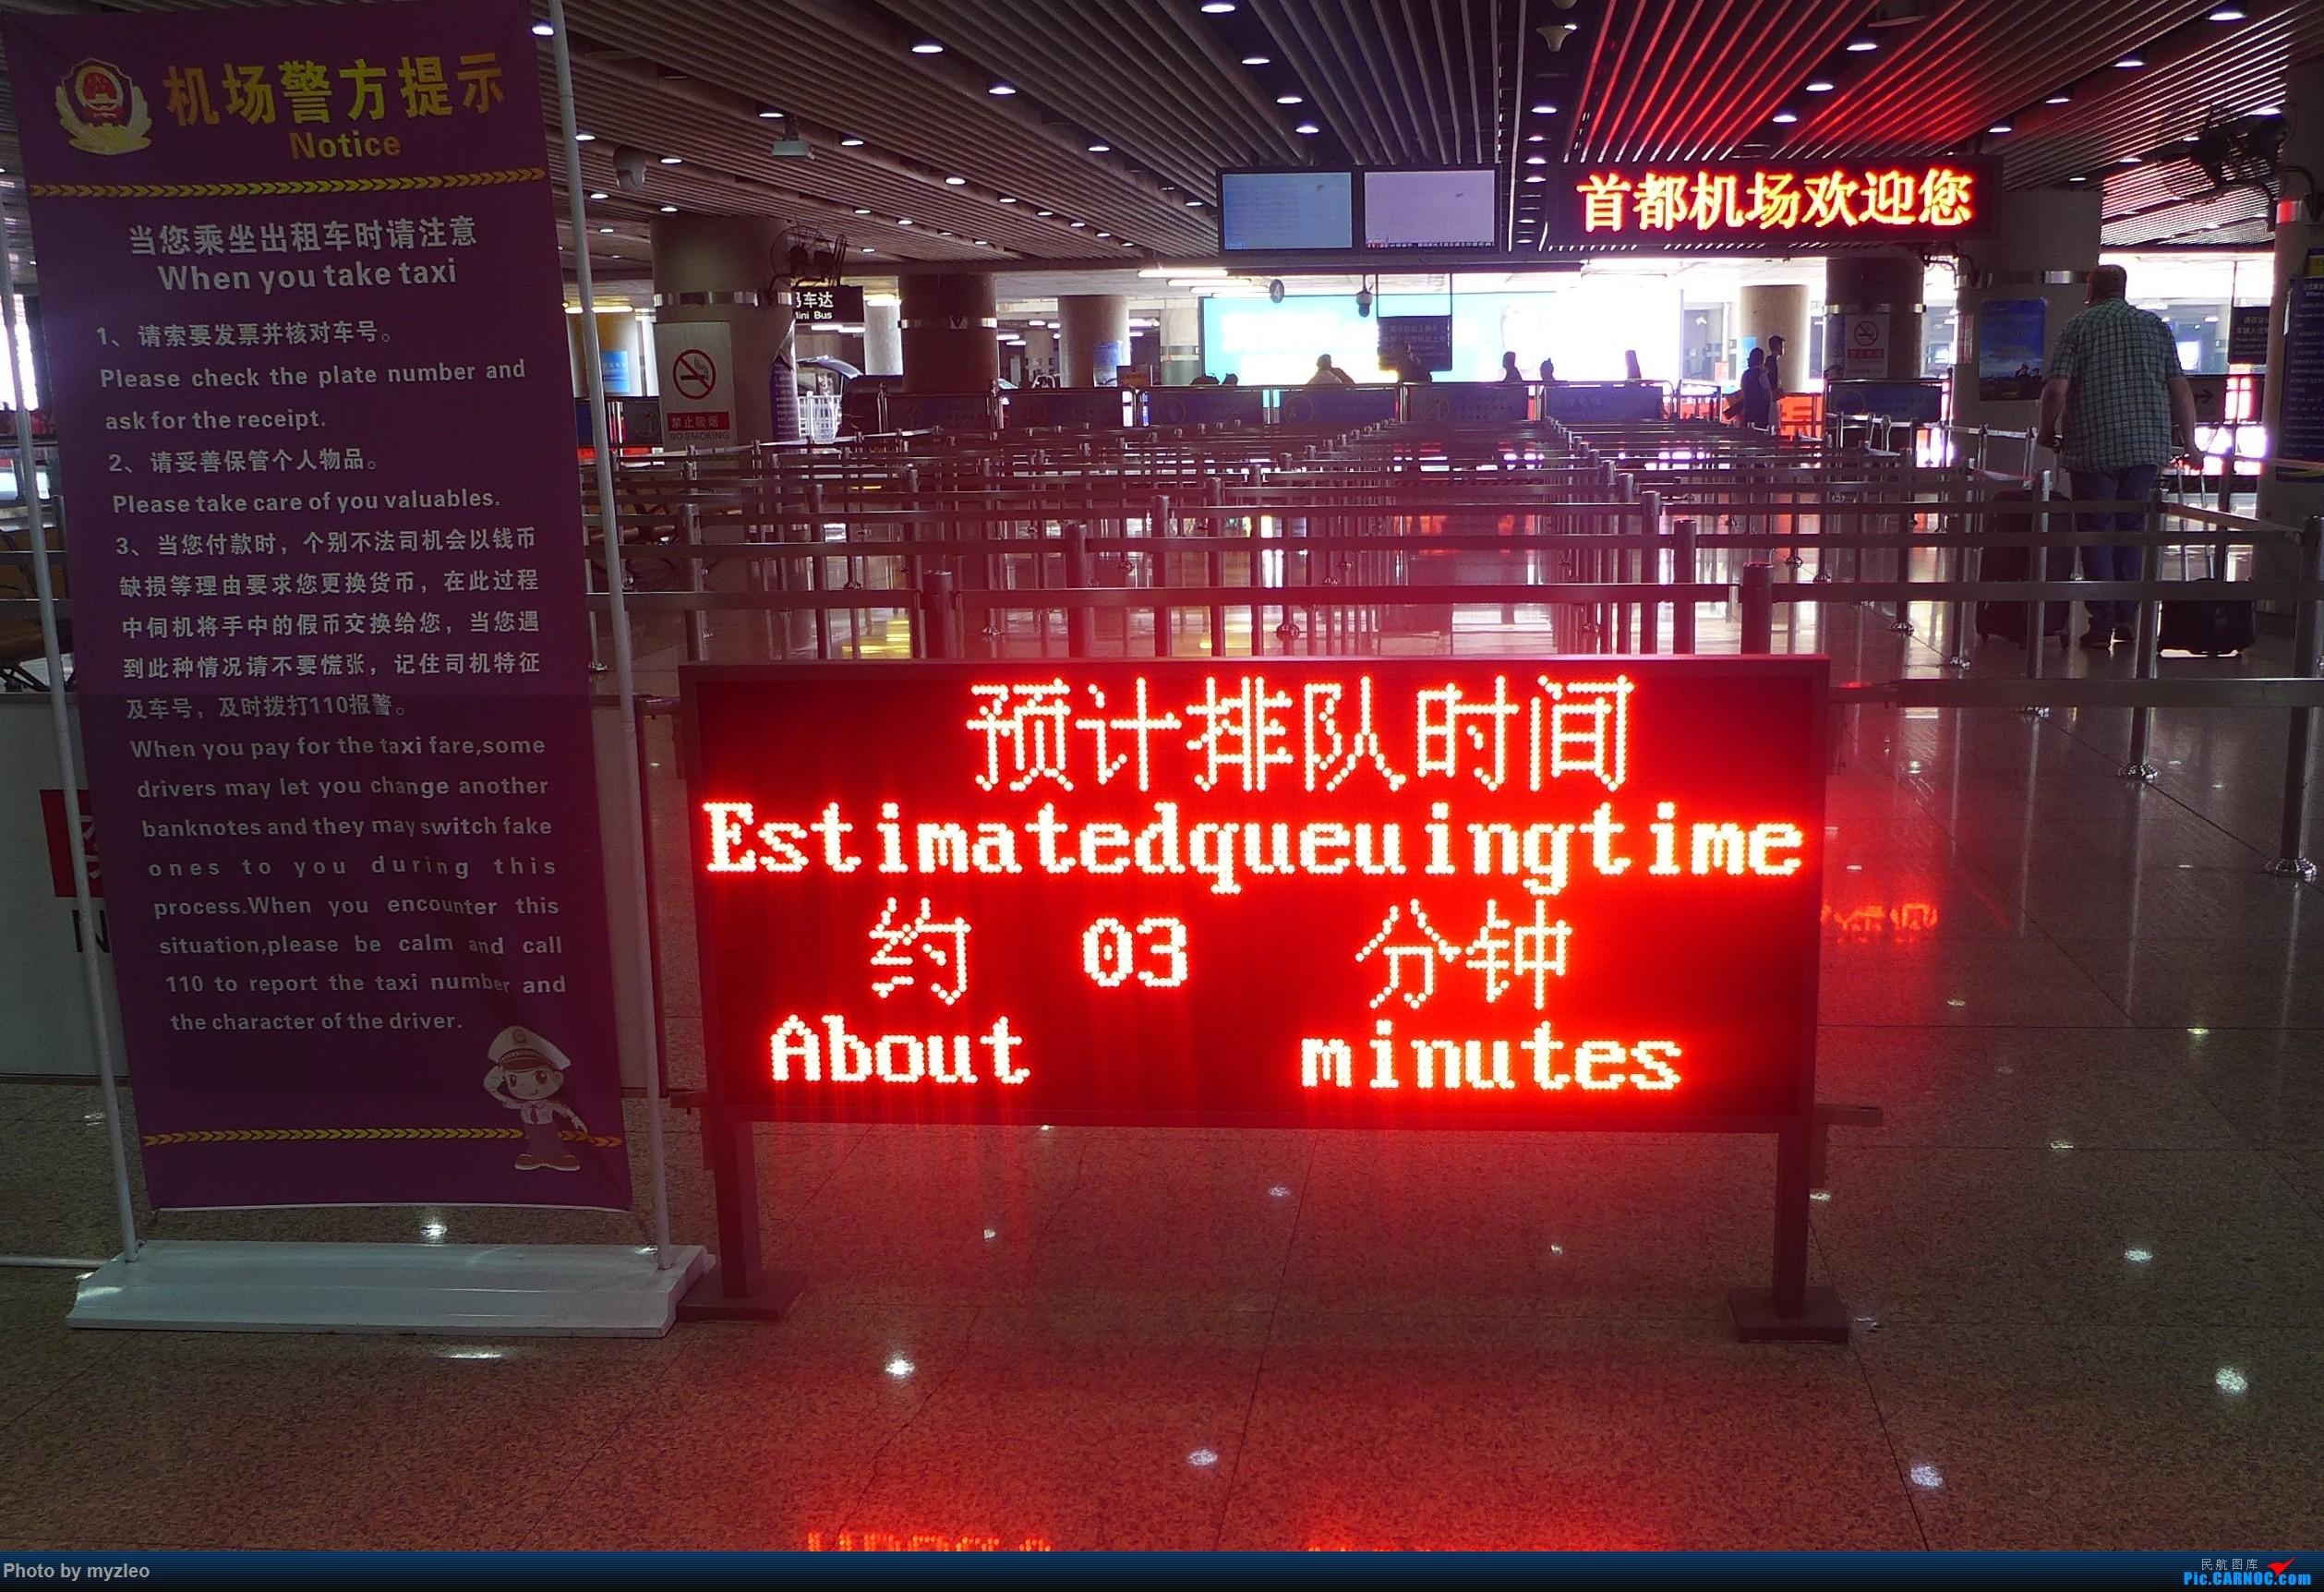 Re:[原创]【myzleo的游记3.1】三访帝都——记一次意外的惊喜,大鹅头初遇,第一次去中关村    中国北京首都国际机场